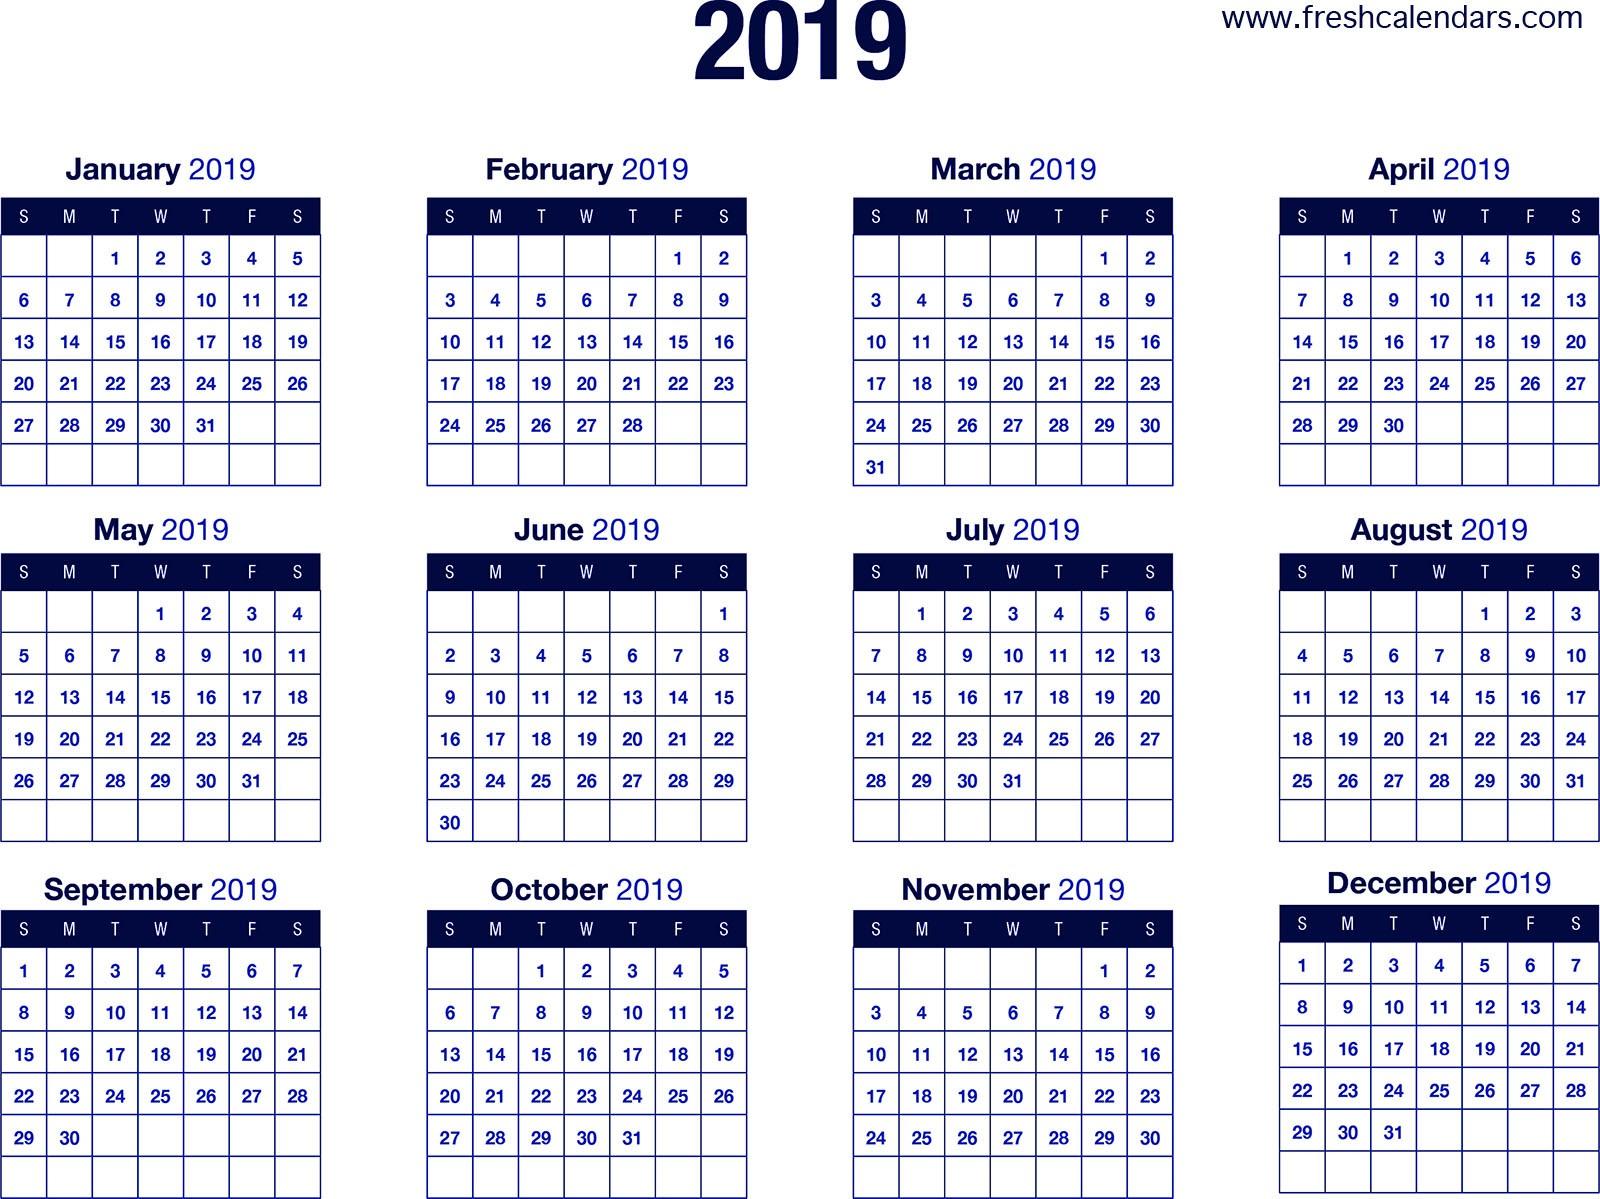 Printable Yearly Calendars 2019 2019 Calendar